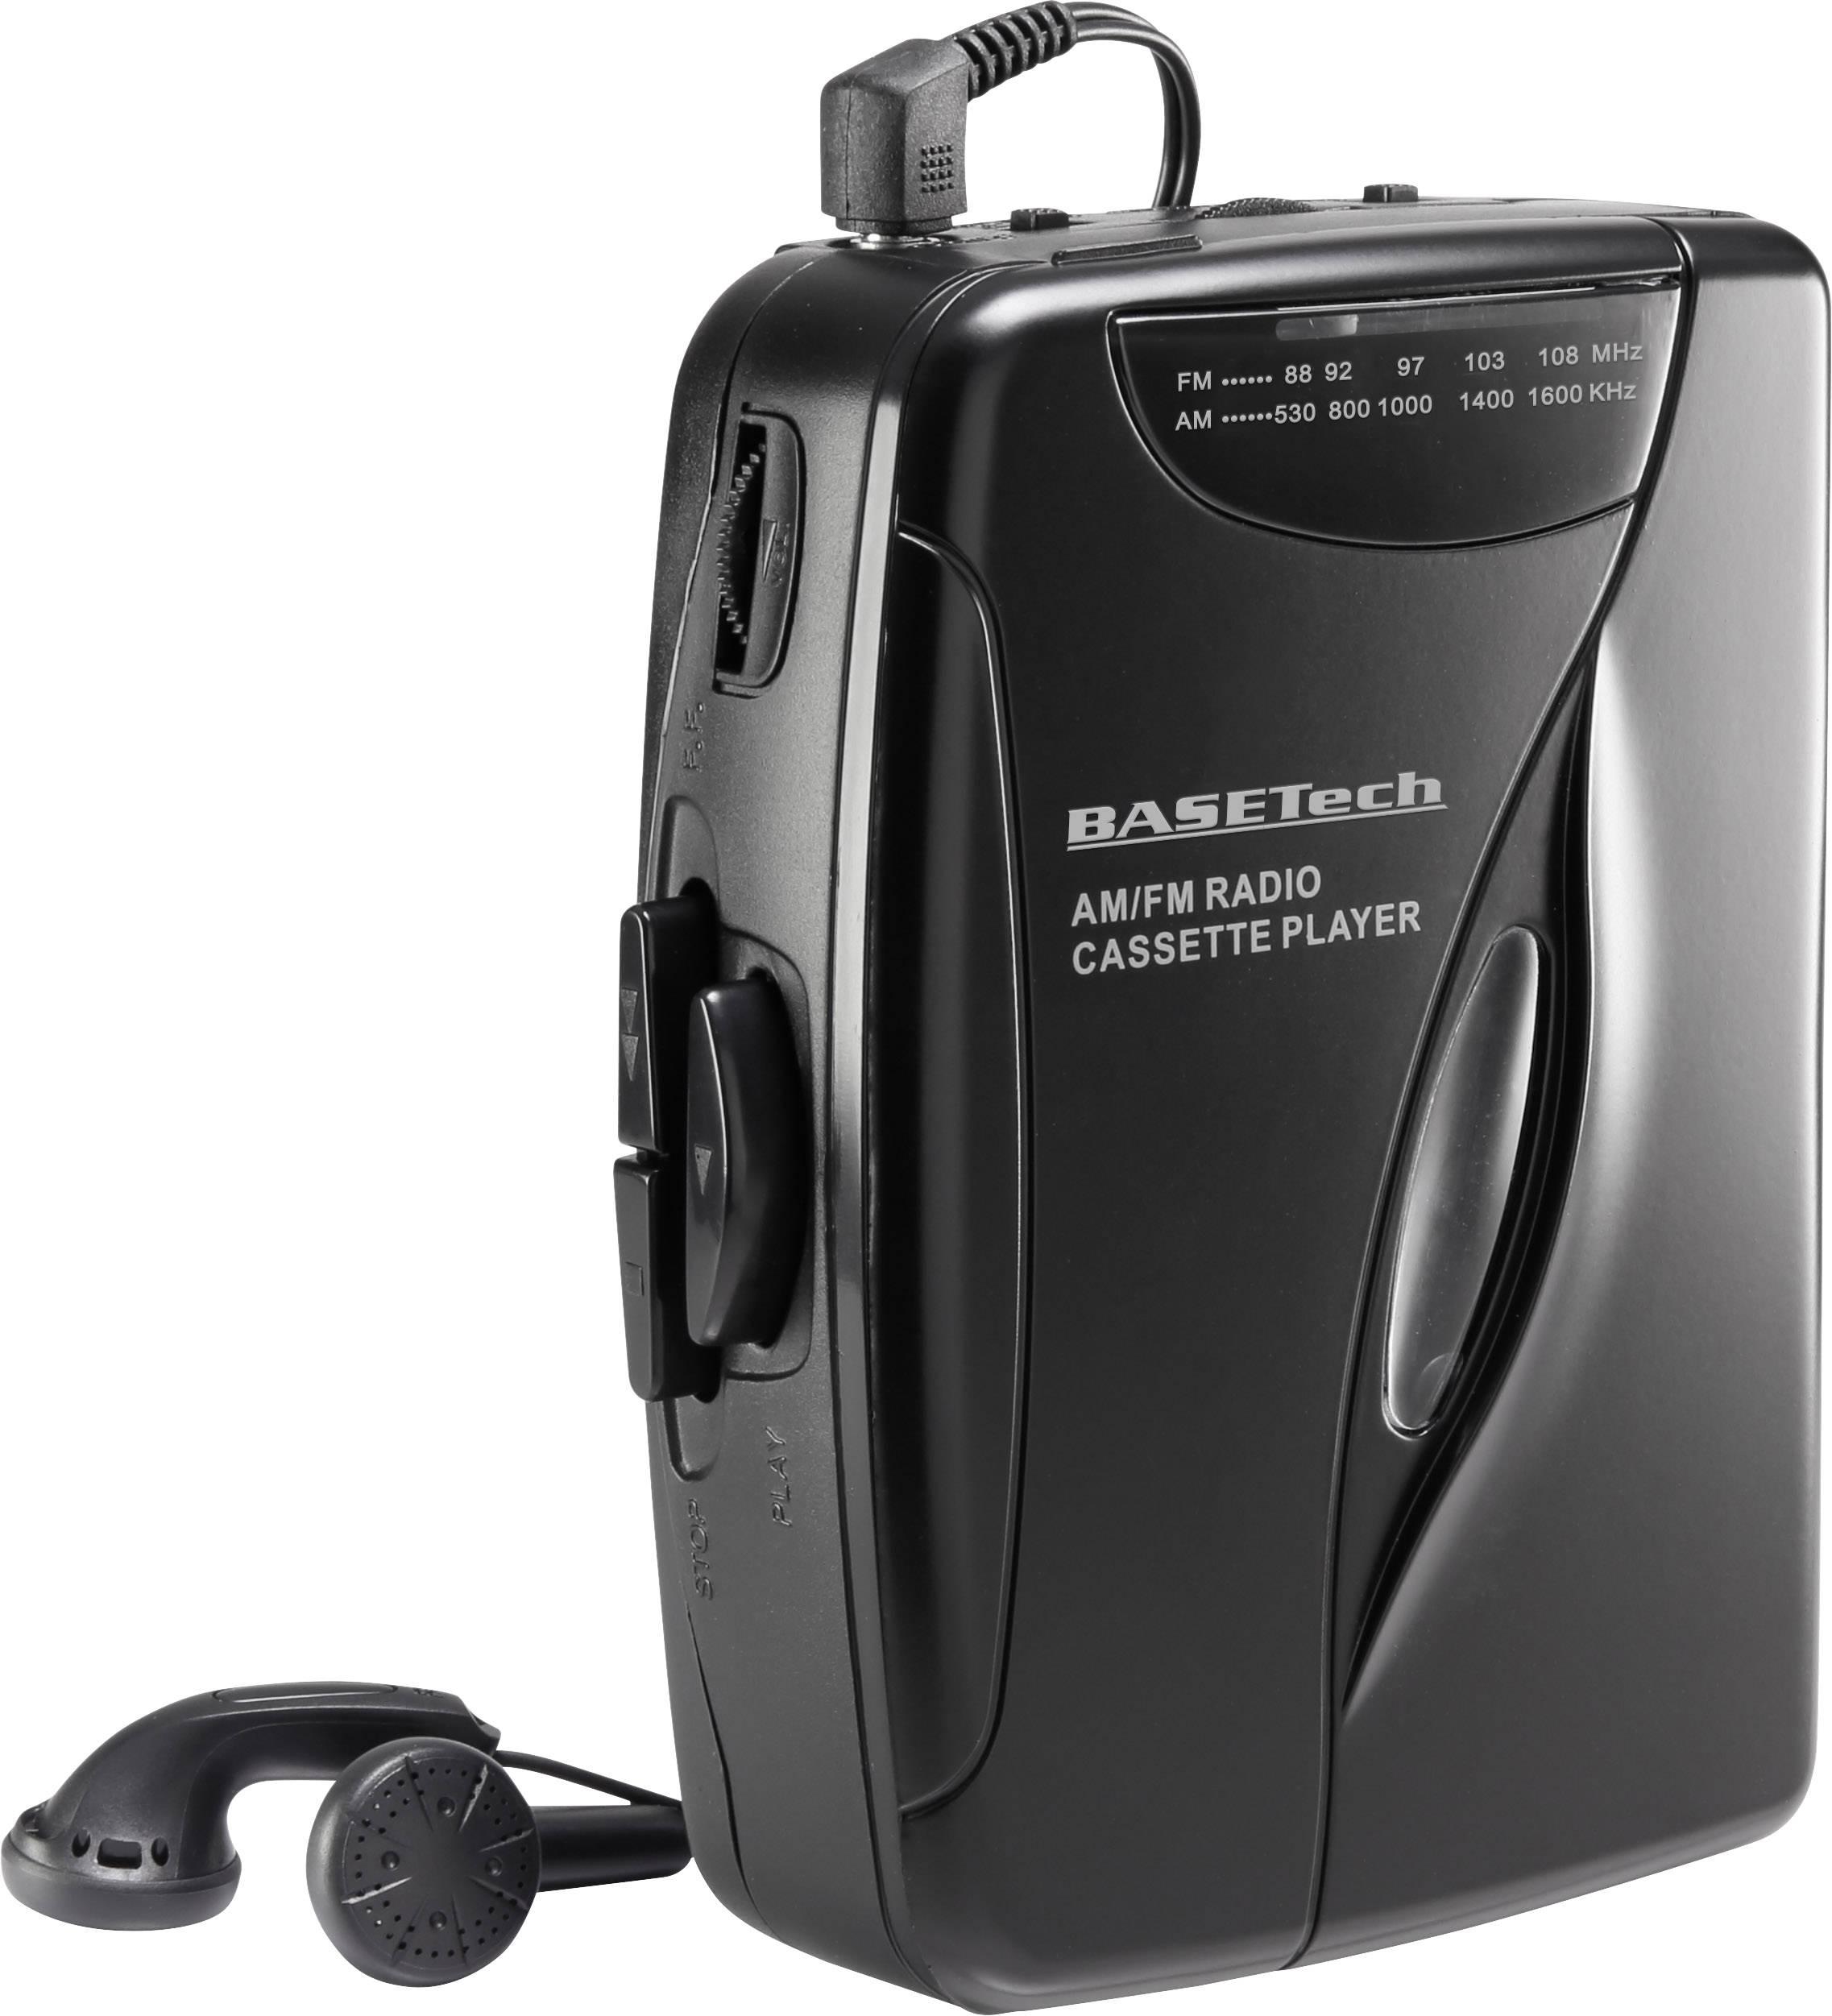 Prenosný prehrávač kaziet - walkman s FM rádiom, Basetech KW-118C, čierna